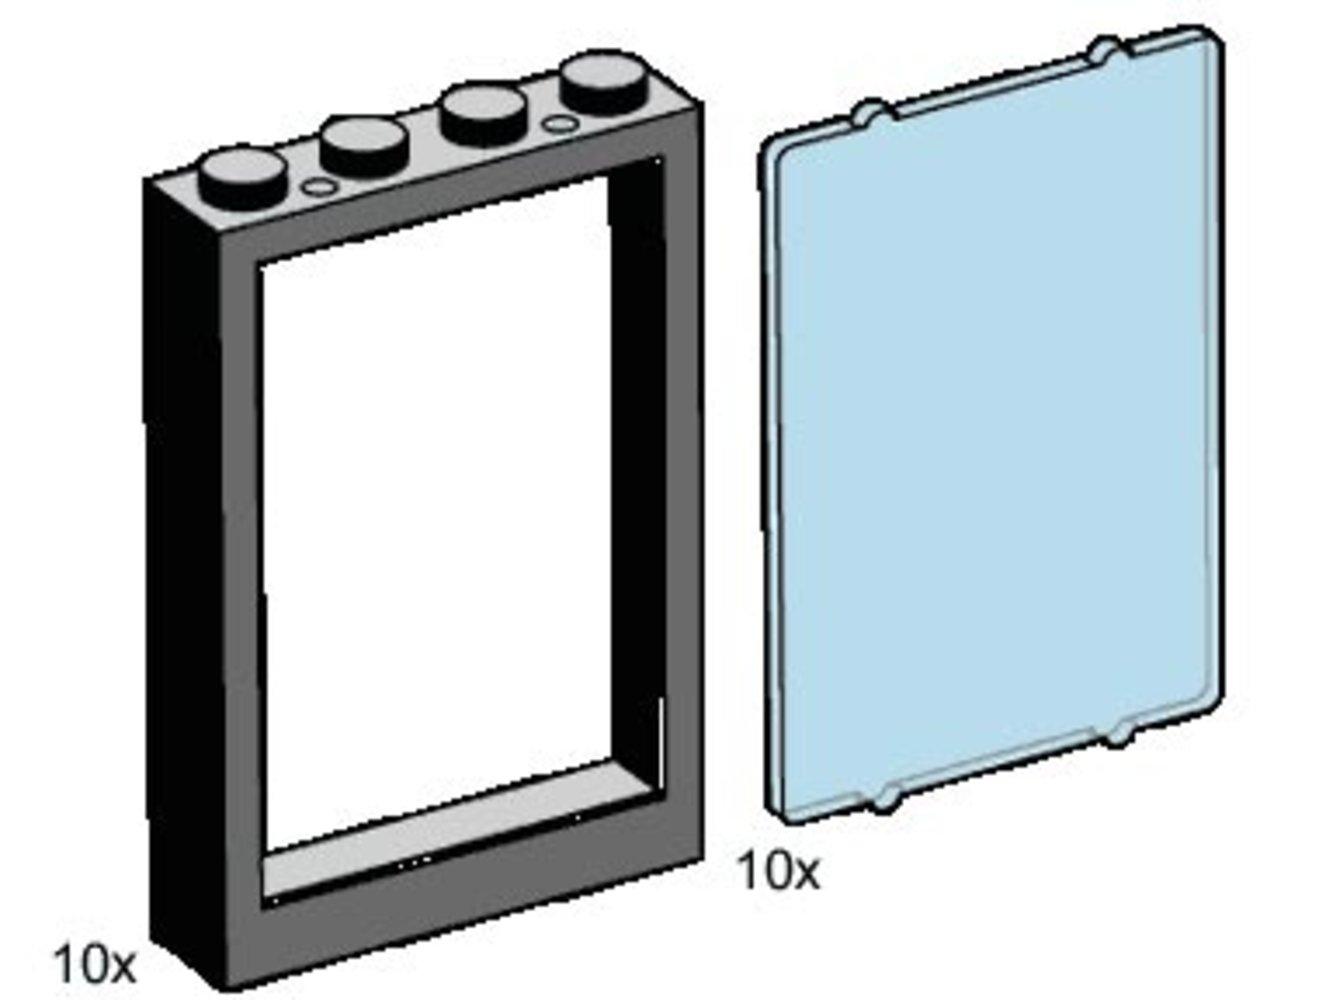 1 x 4 x 5 Black Window Frames, Transparent Blue Panes